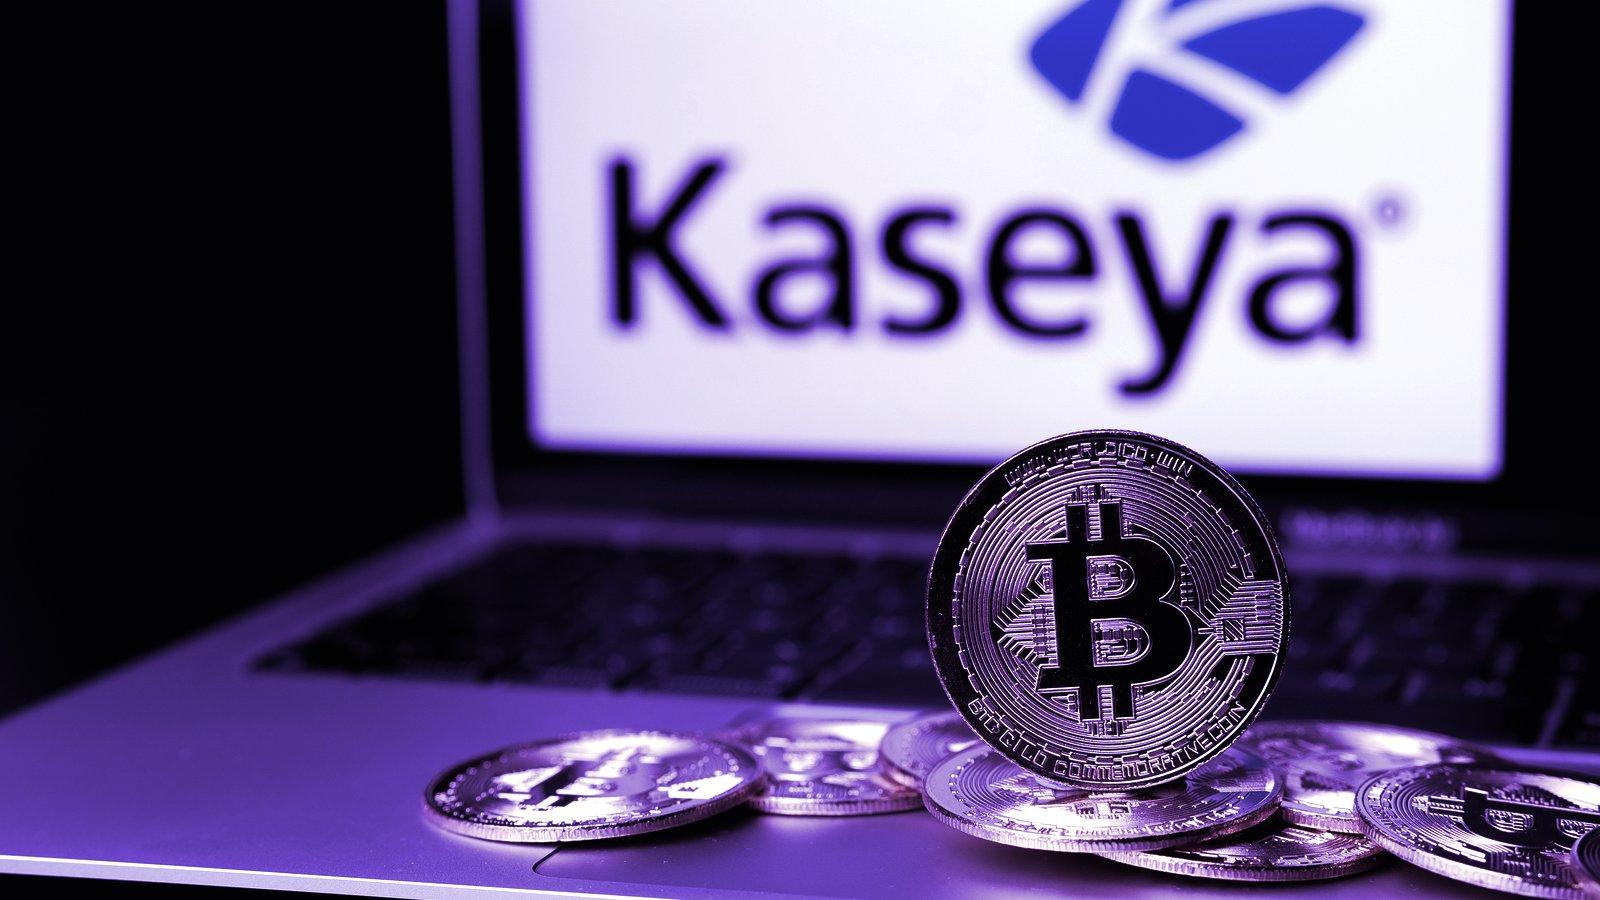 Kaseya Denies Paying $70 Million Bitcoin Ransom